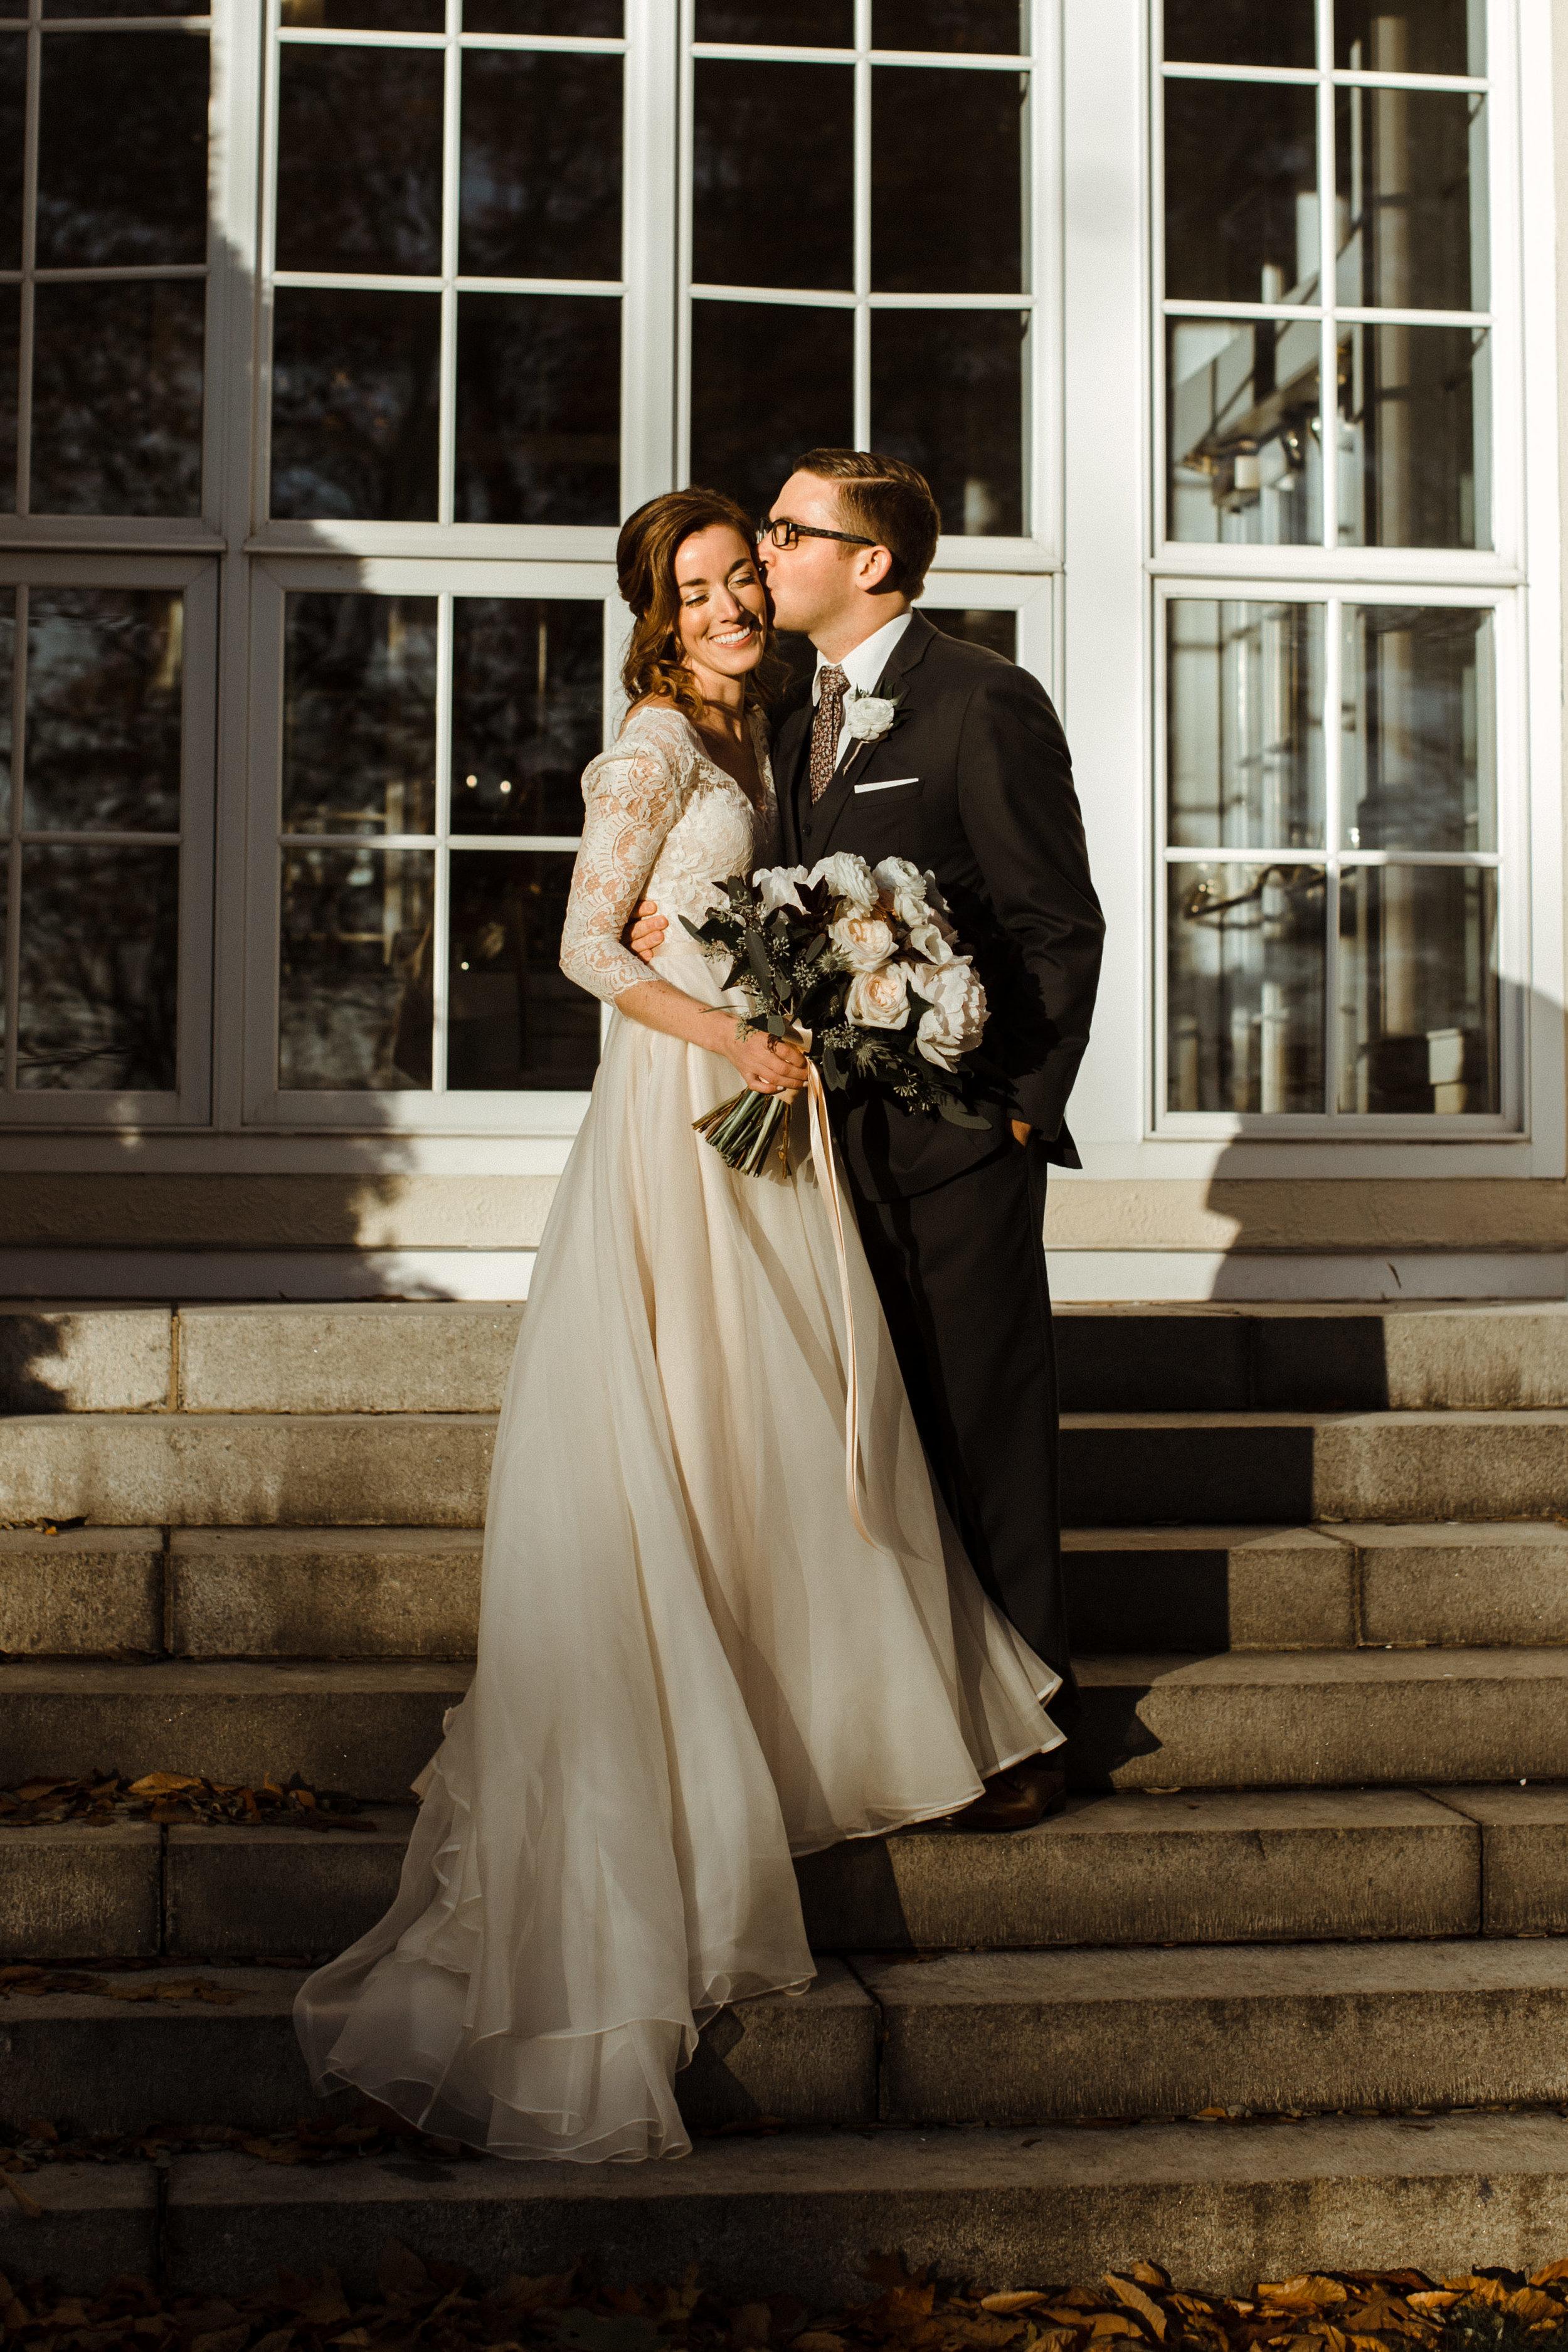 beverly_ma_wedding-18.jpg